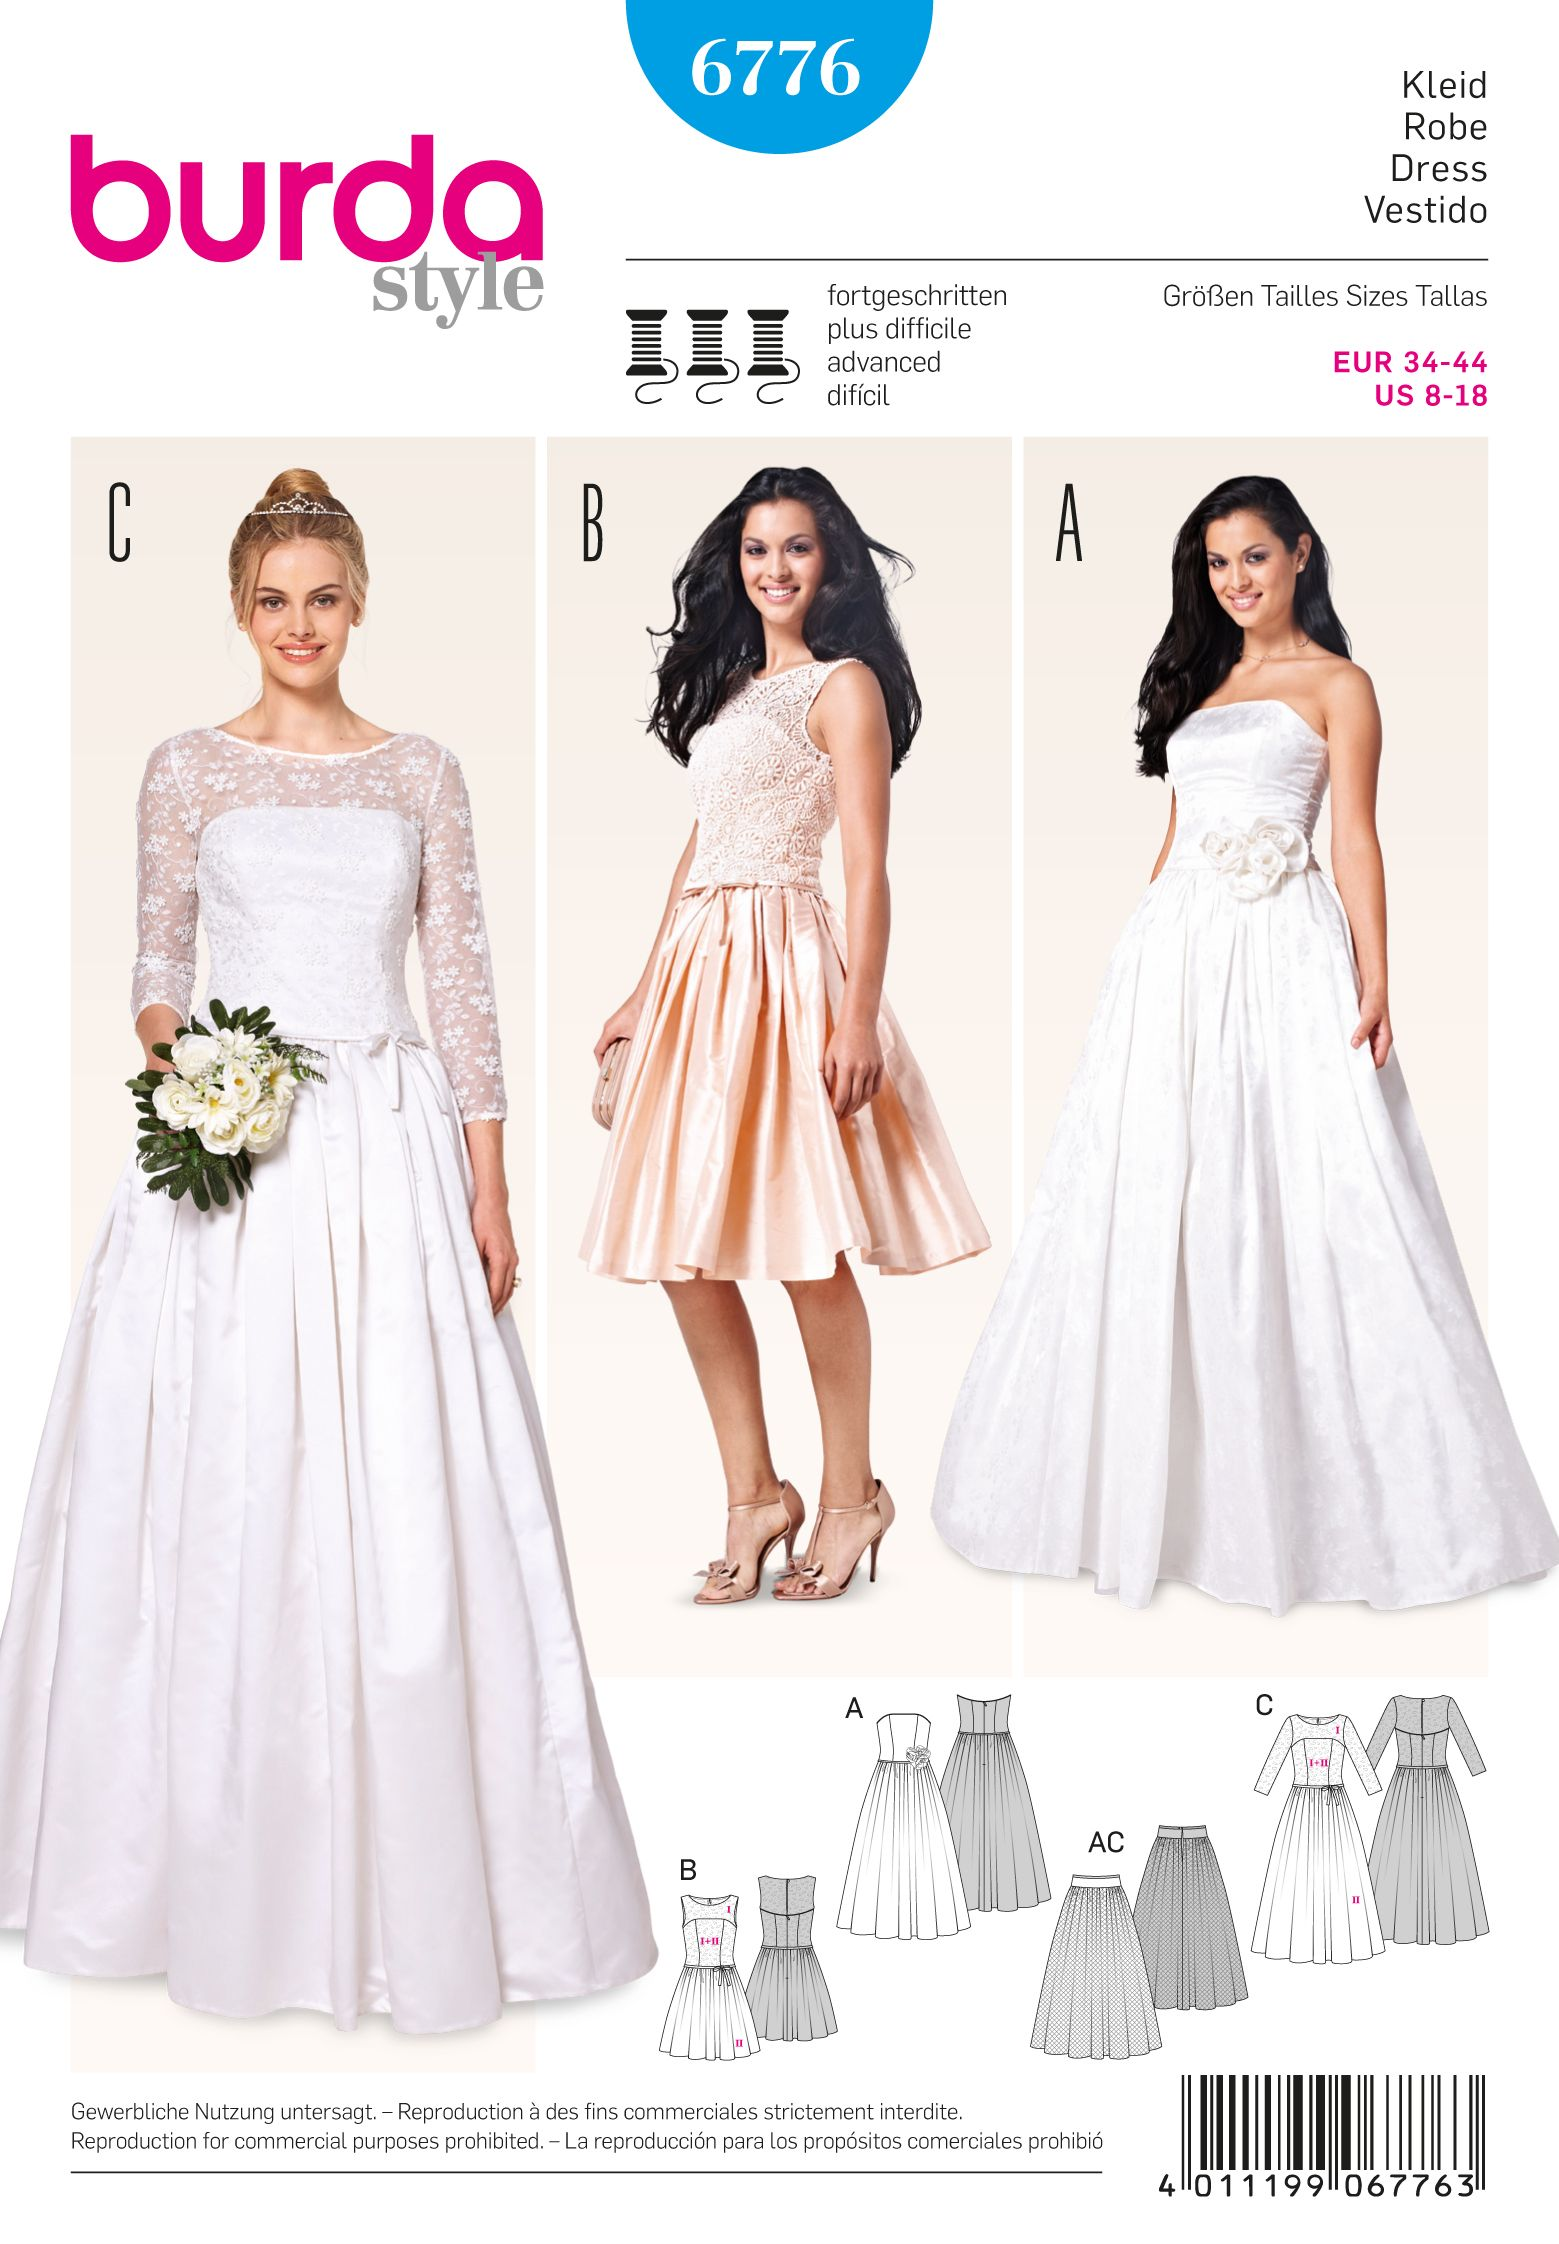 Burda 6776 Burda Style Evening & Bridal Wear | Lieferung, Brautkleid ...